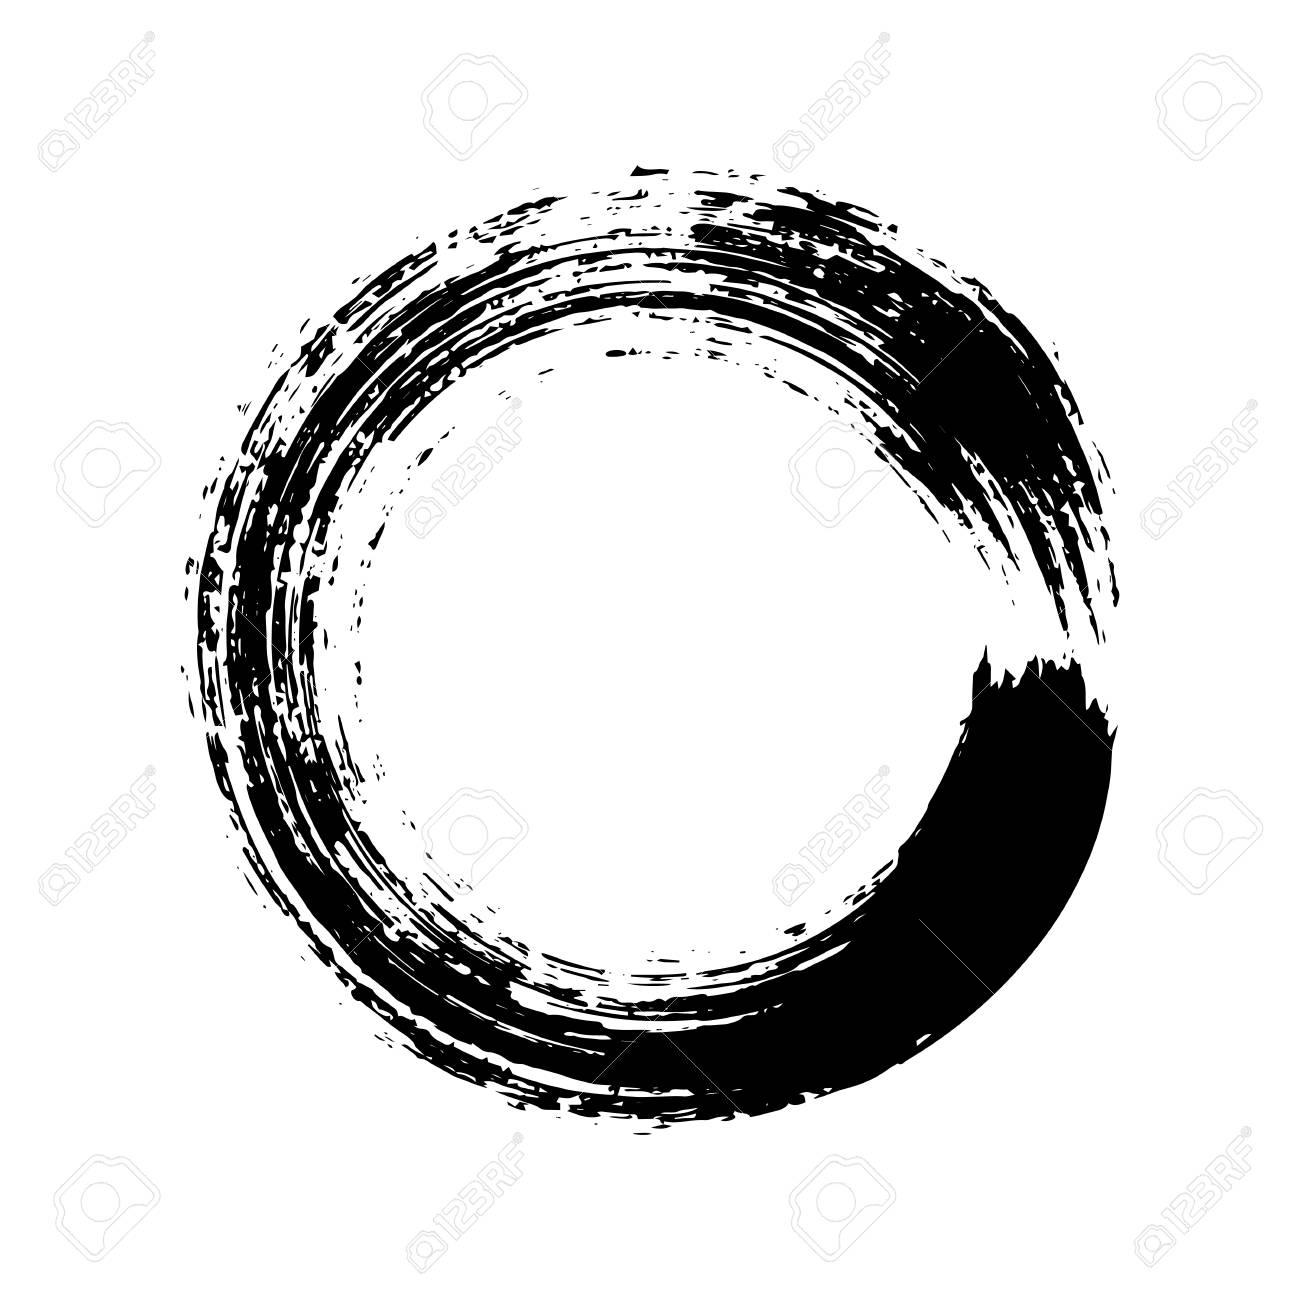 White Paint Stroke Clipart